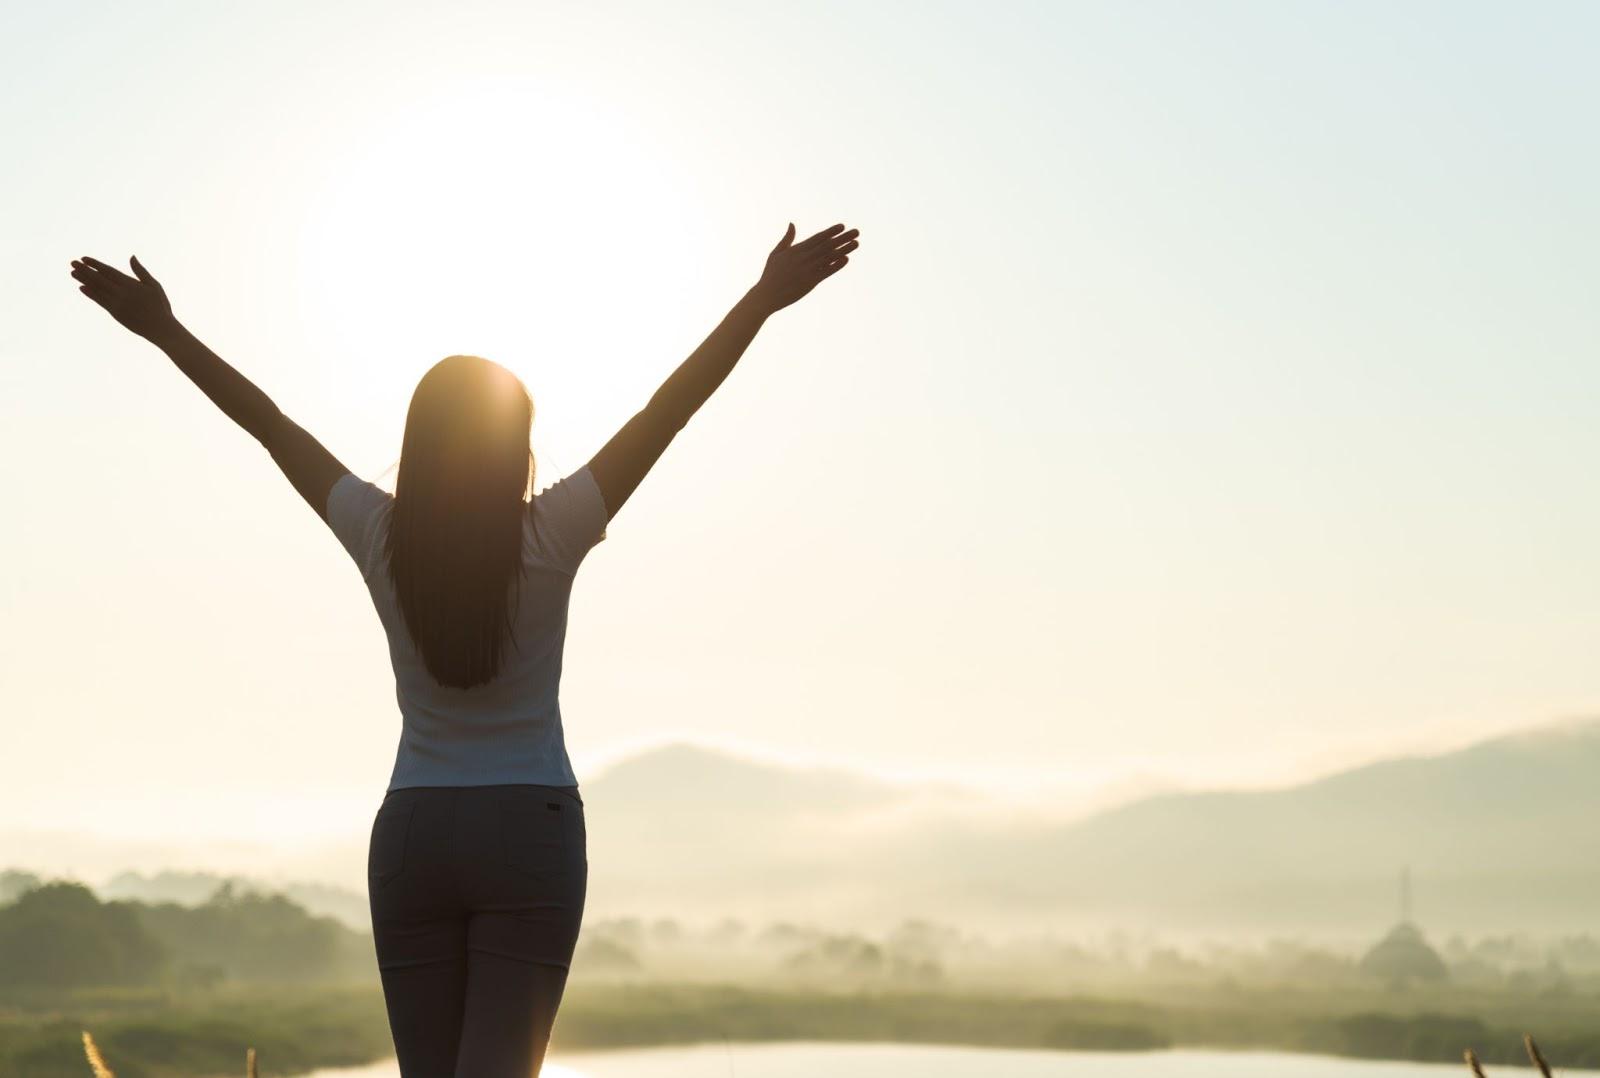 Natural energy: A woman raises her hands toward the rising sun